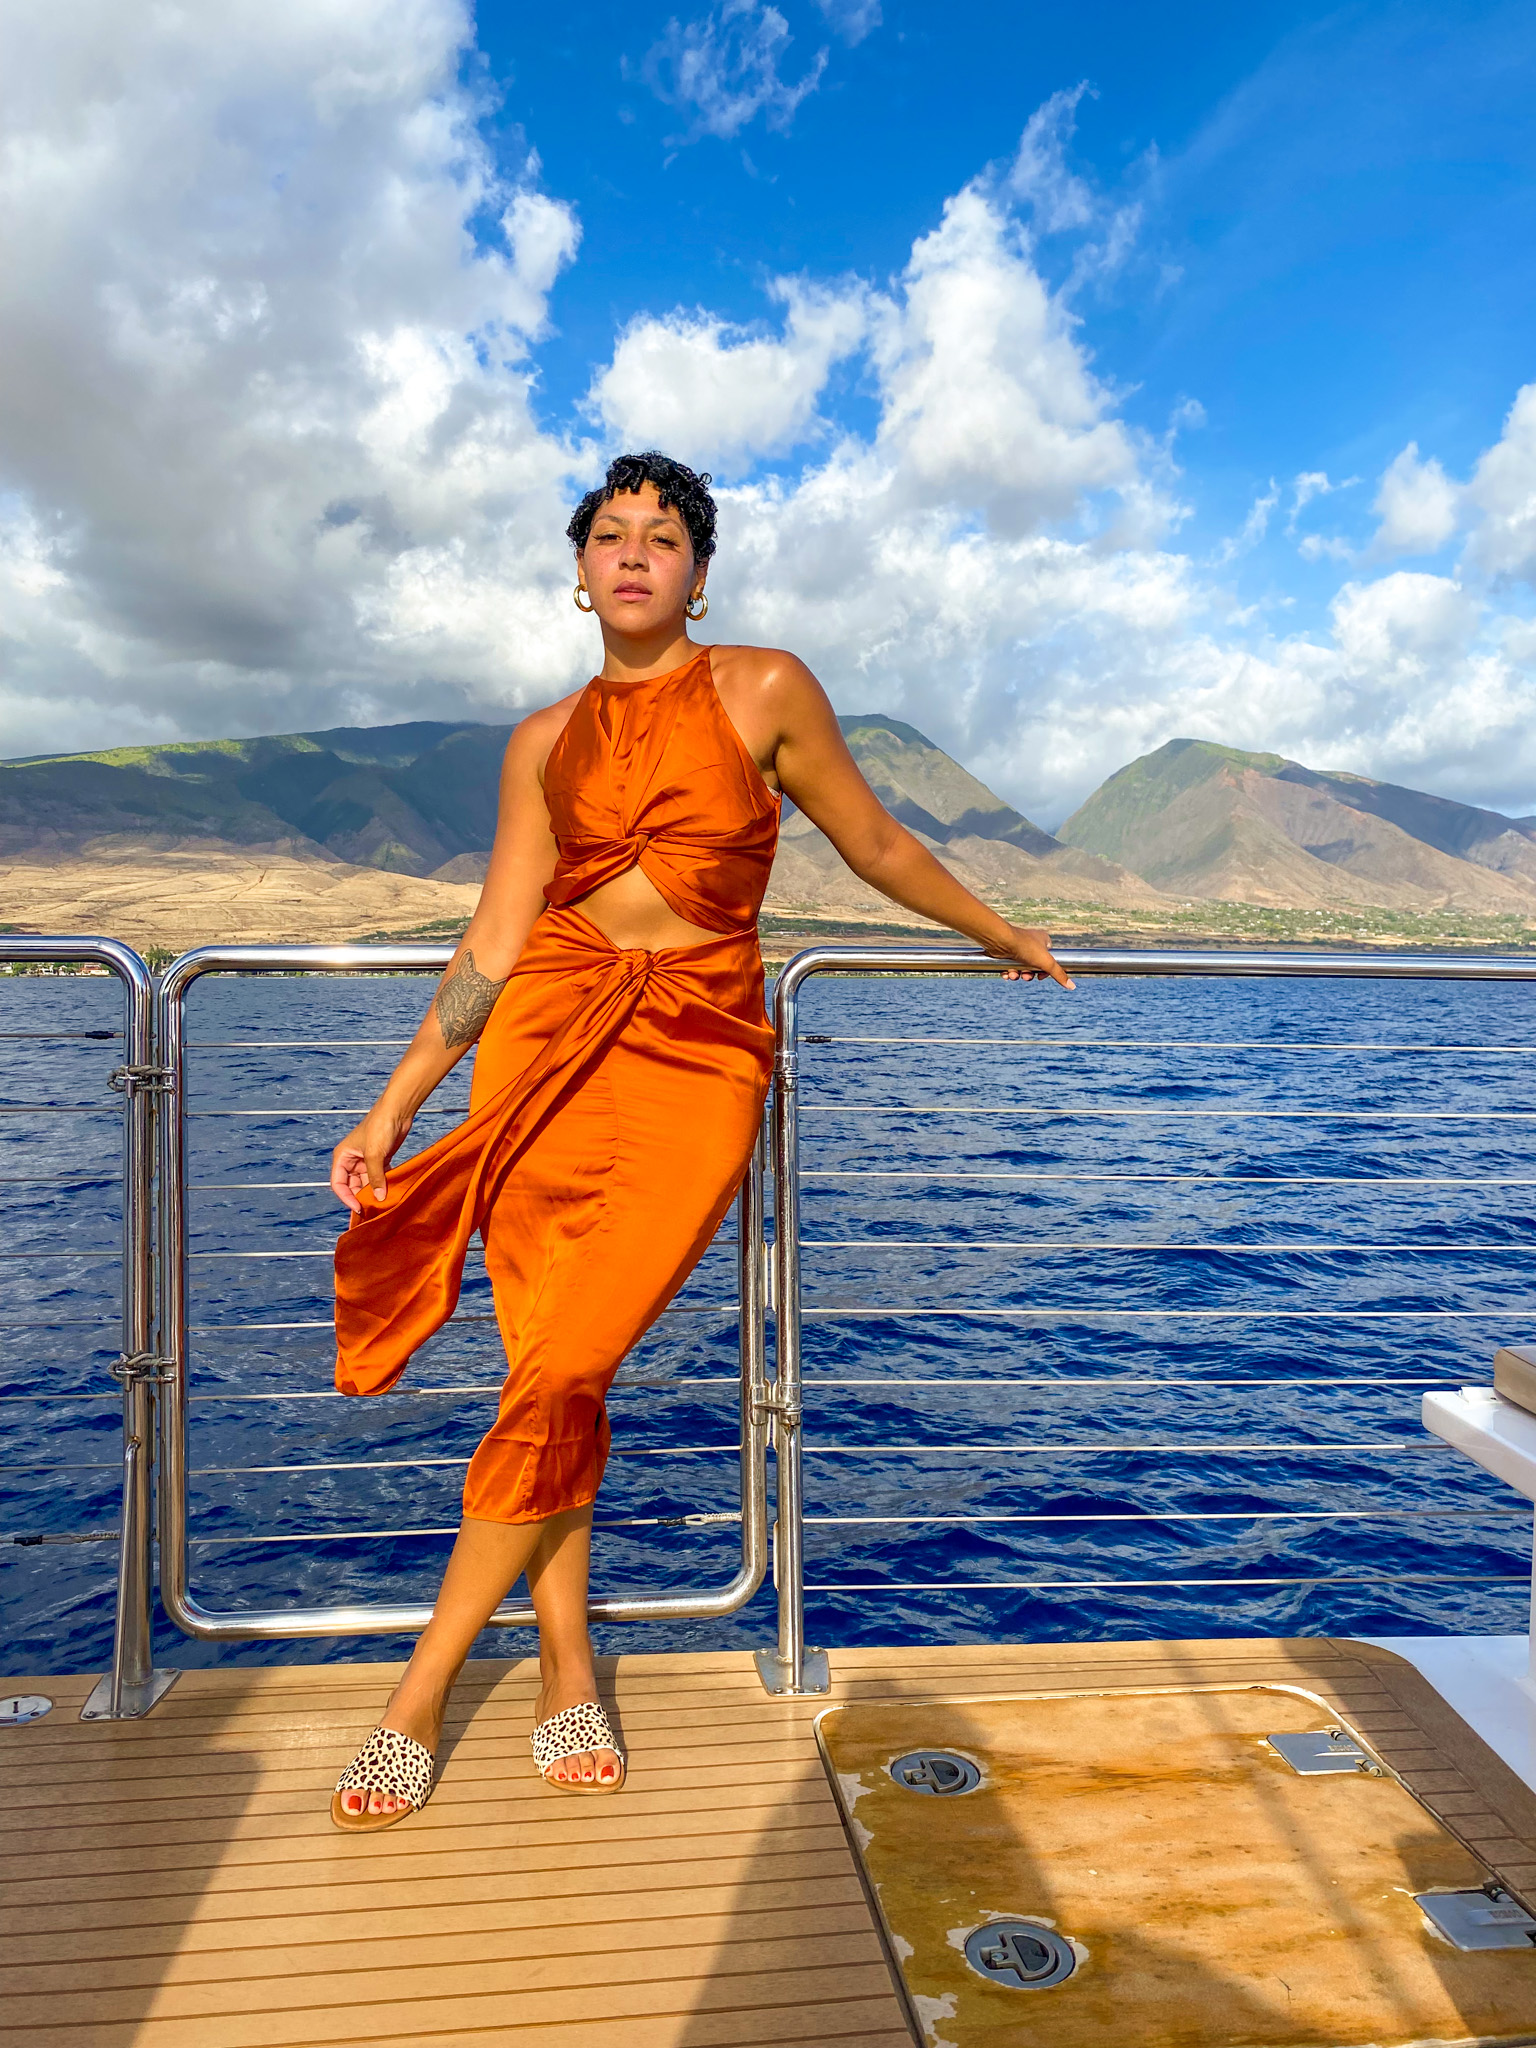 traveling to hawaii maui, what to do hawaii maui, maui covid travel, luxury travel, black girl travel guide, trilogy sunset cruise